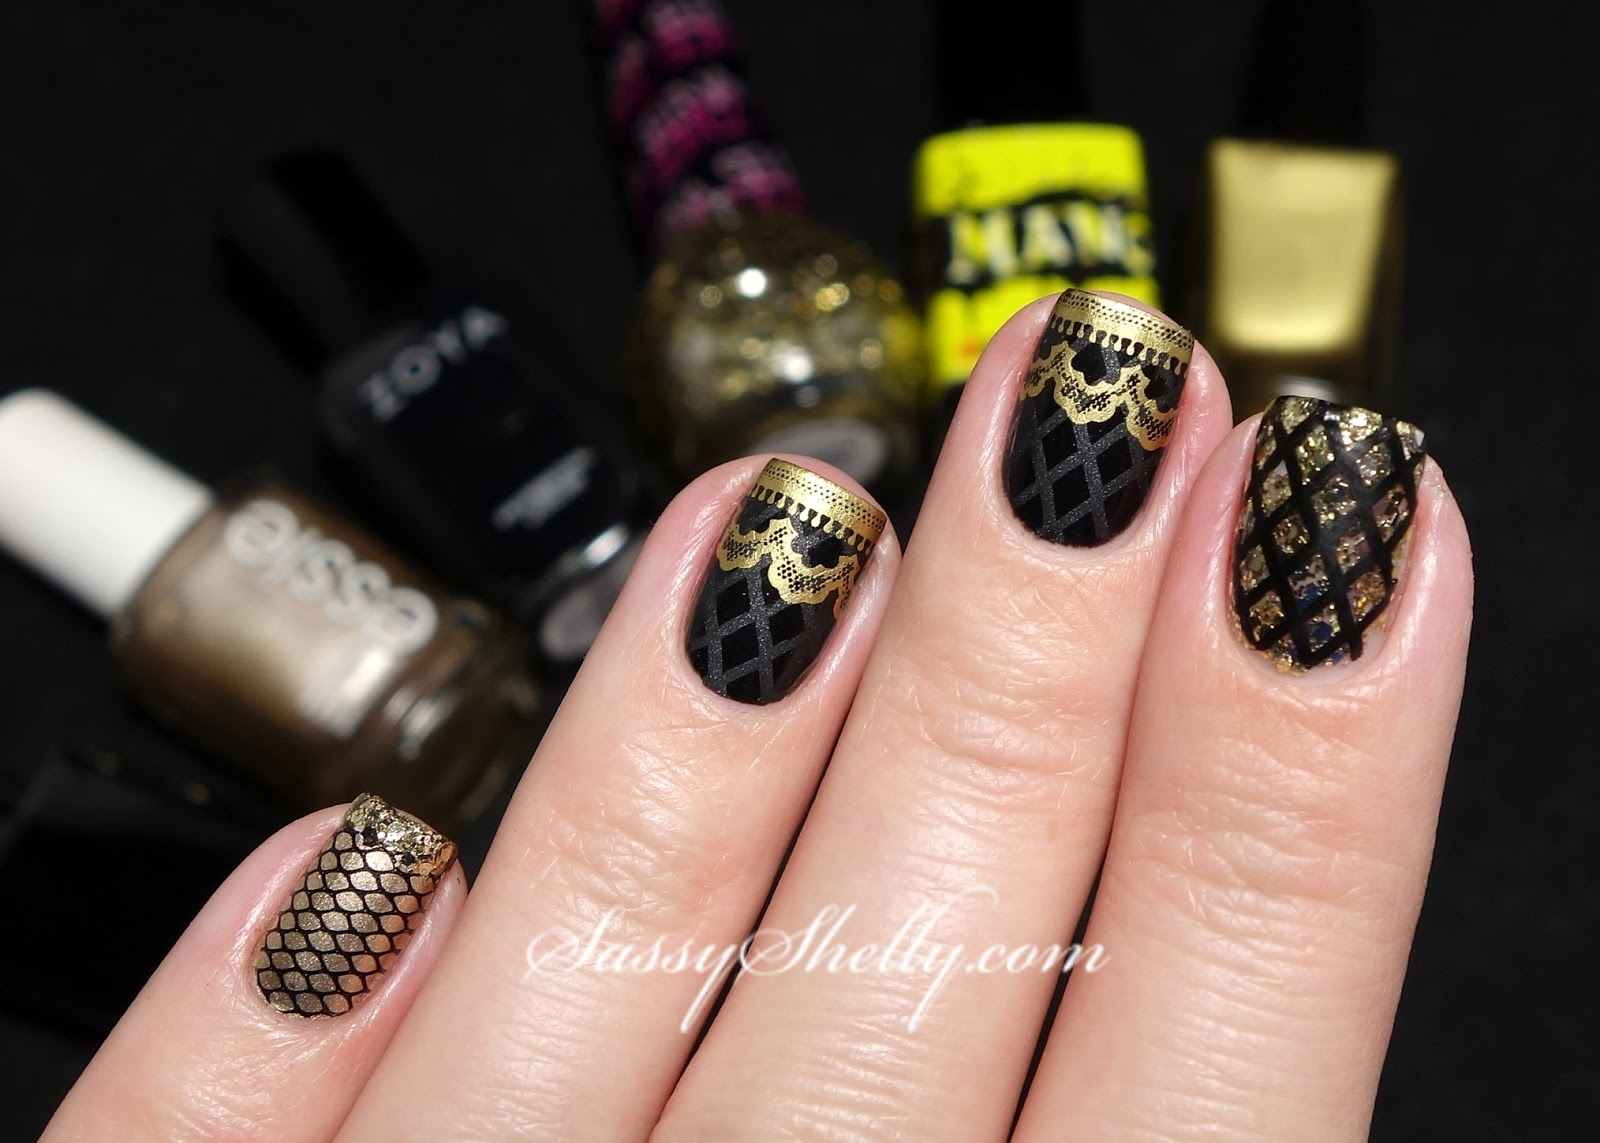 Fancy Black And Gold Nail Image Motif - Nail Art Ideas - morihati.com